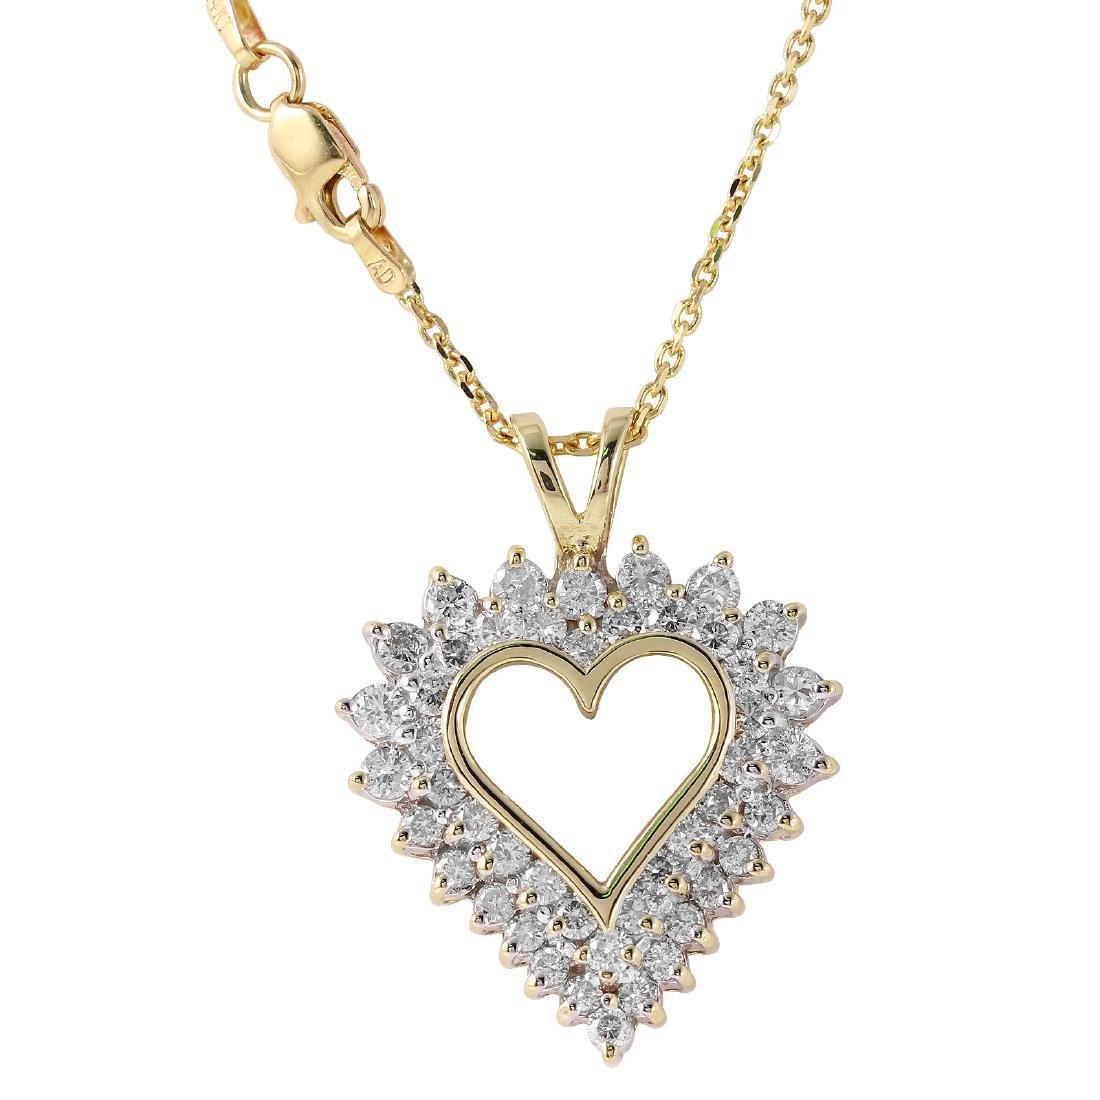 14KT White Gold Diamond Heart Pendant Necklace